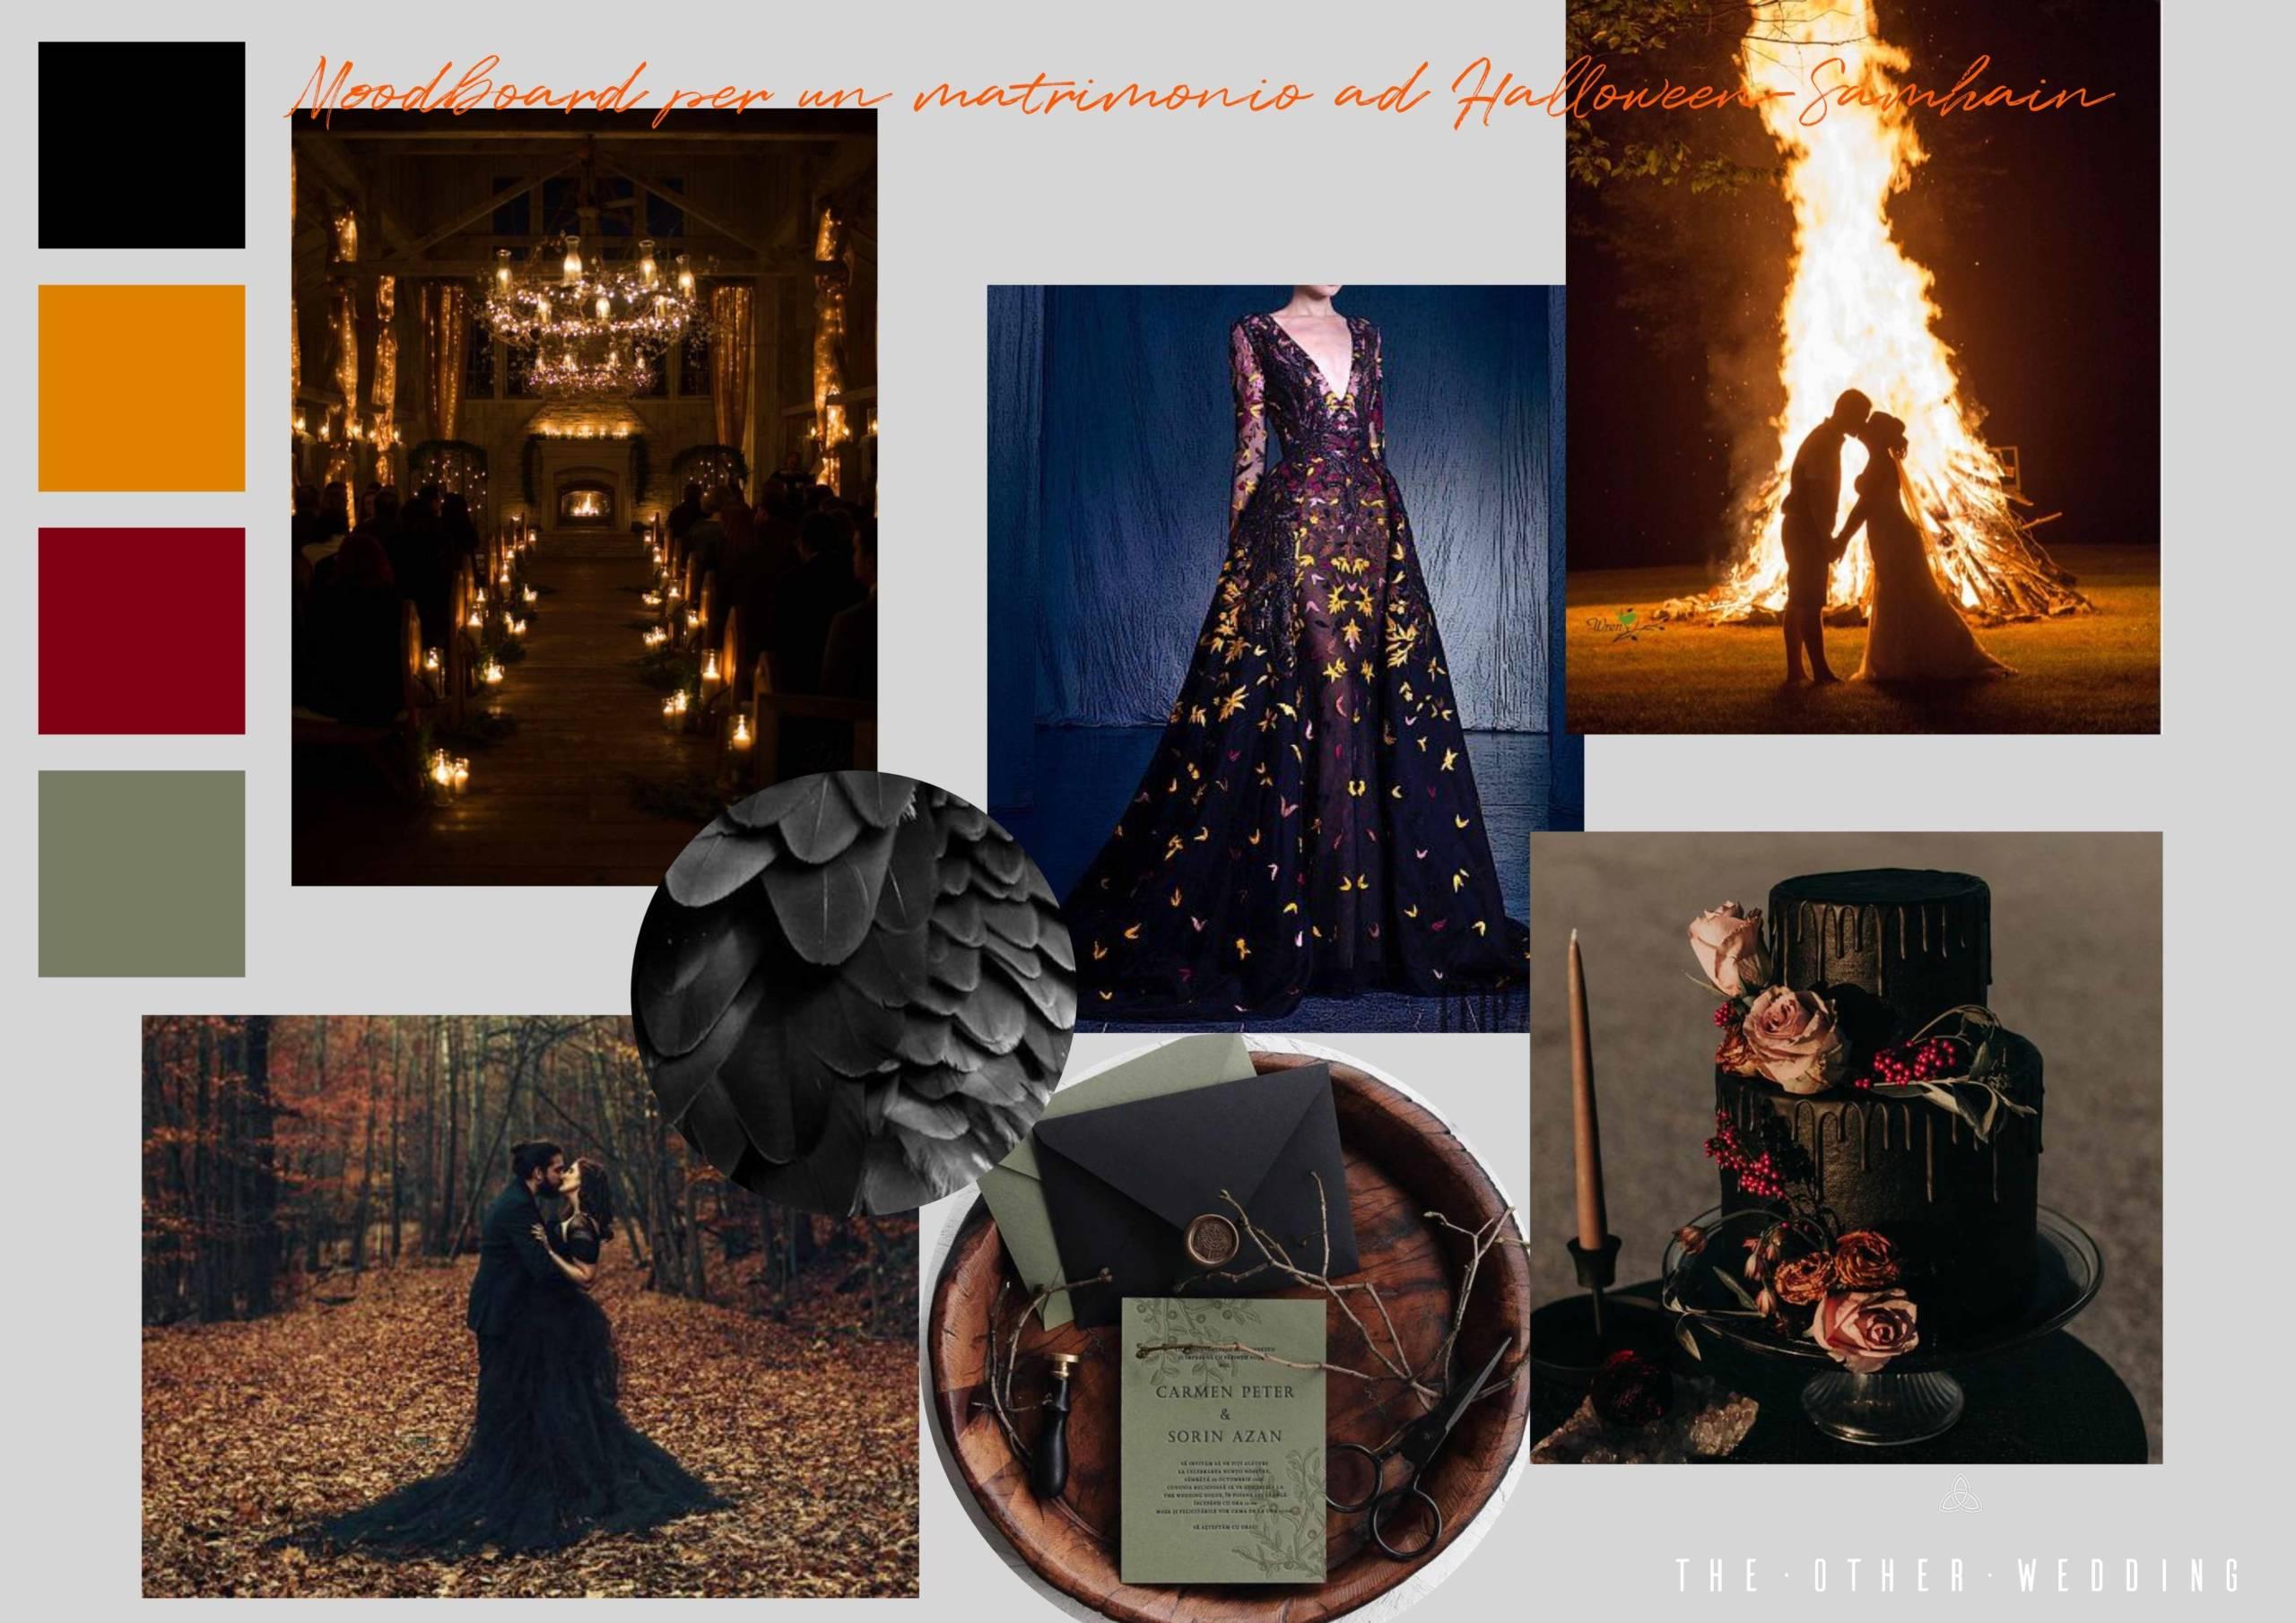 The Other Wedding_Moodboard per un matrimonio ad Halloween-Samhain